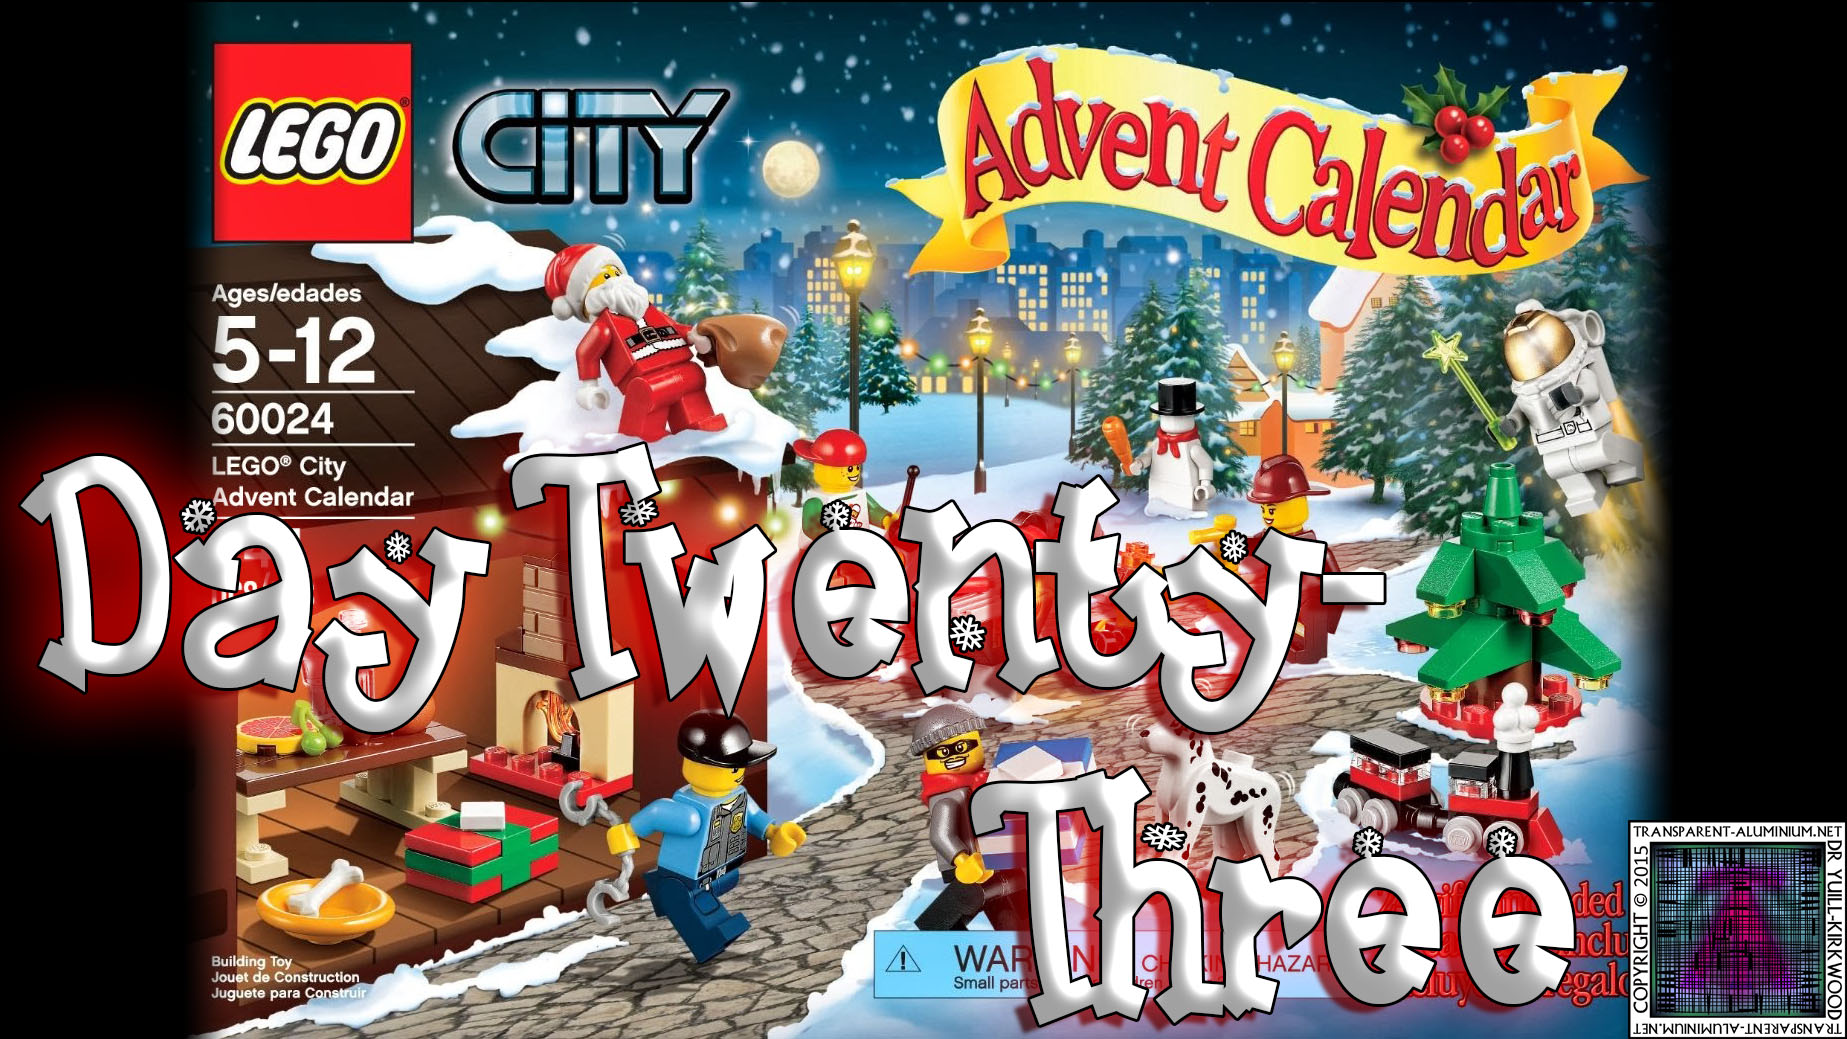 LEGO City Advent Calendar 60024 thumb - Day 23